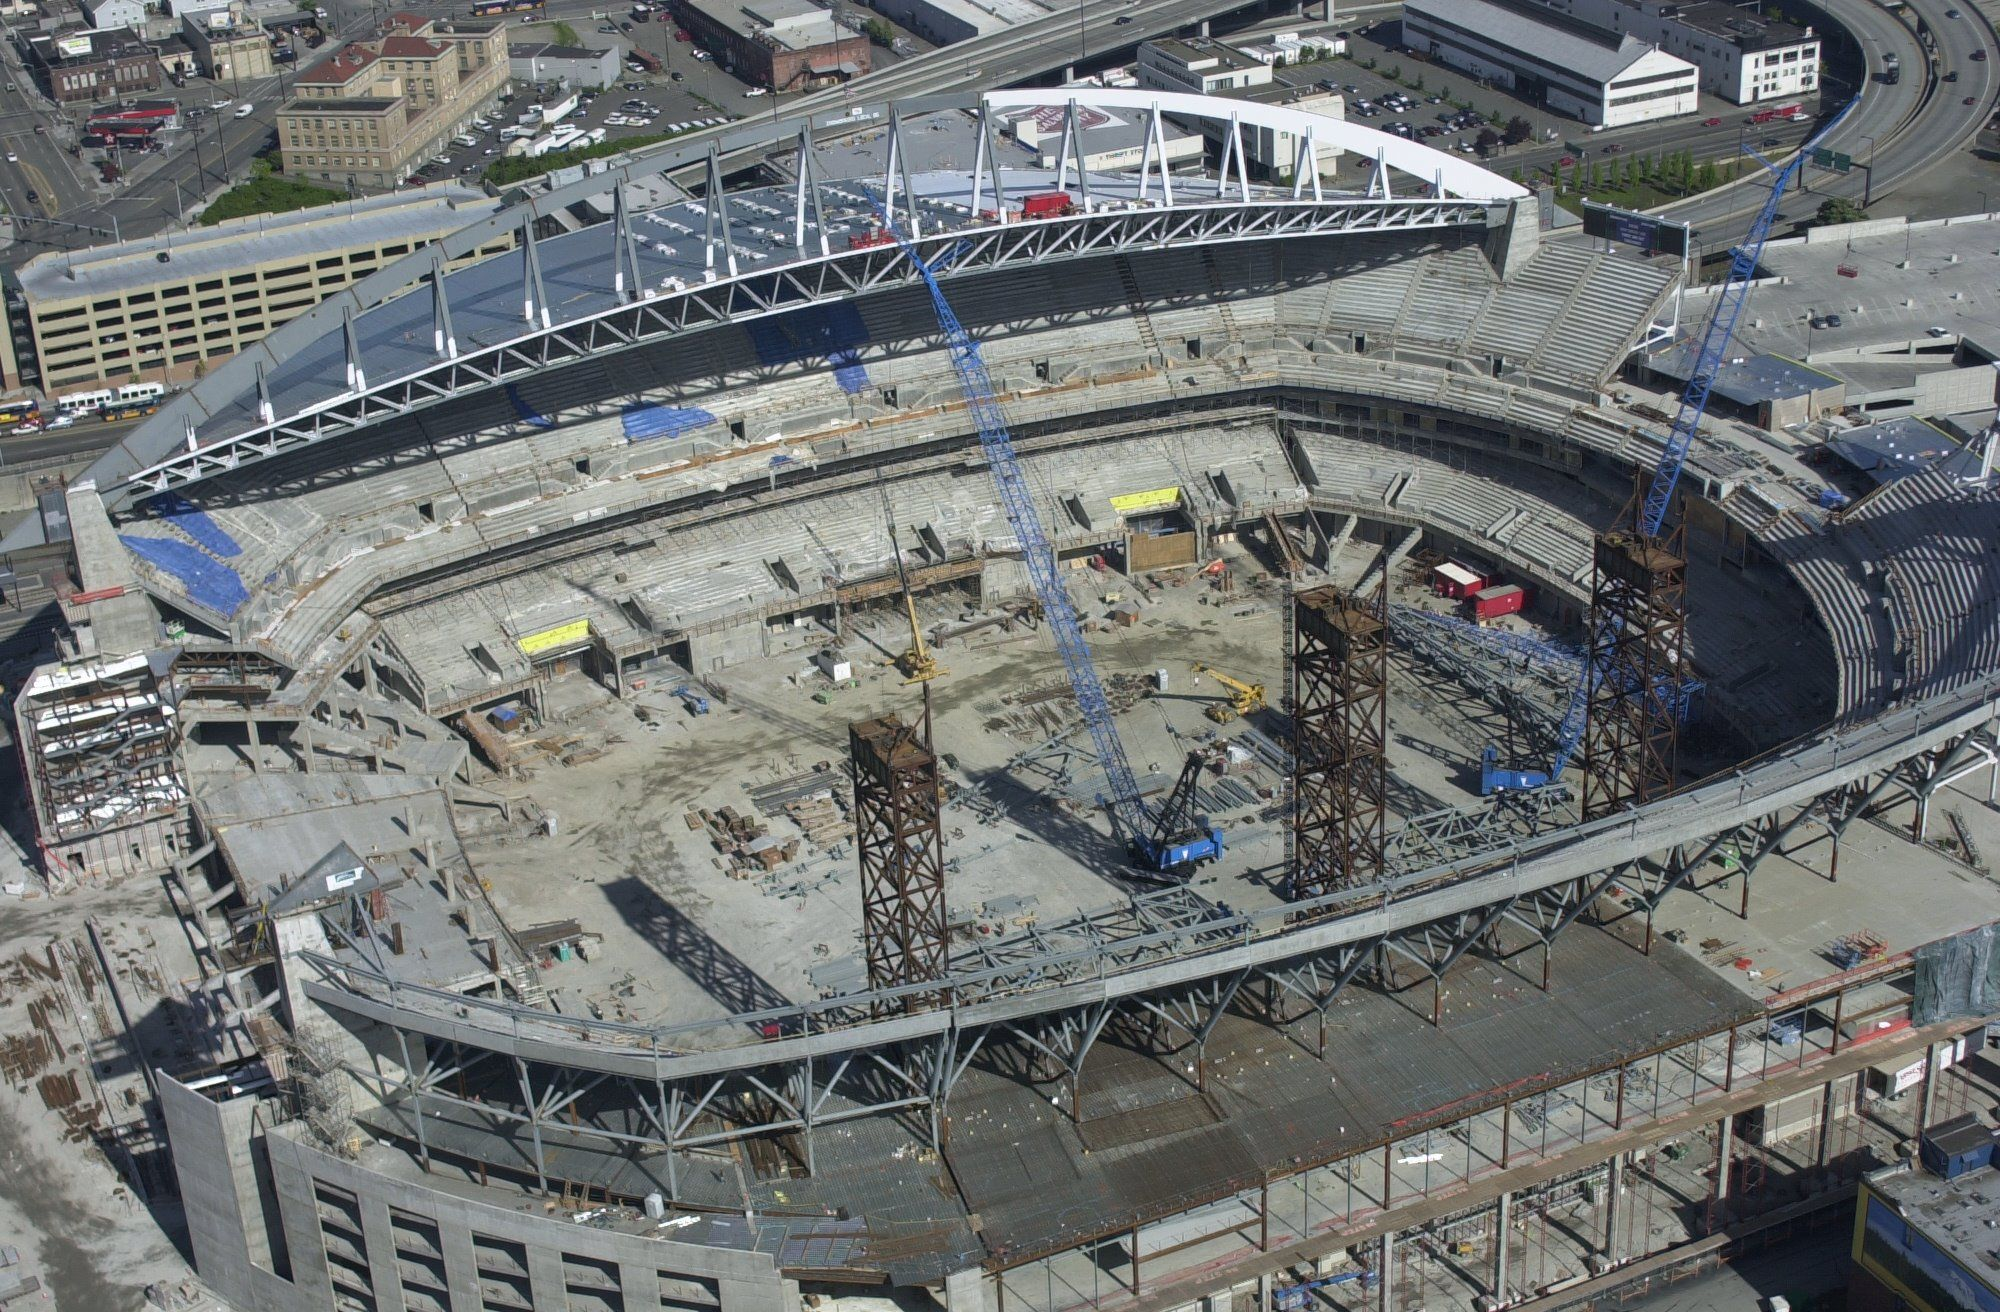 Seattle Seahawks Centurylink Field While Under